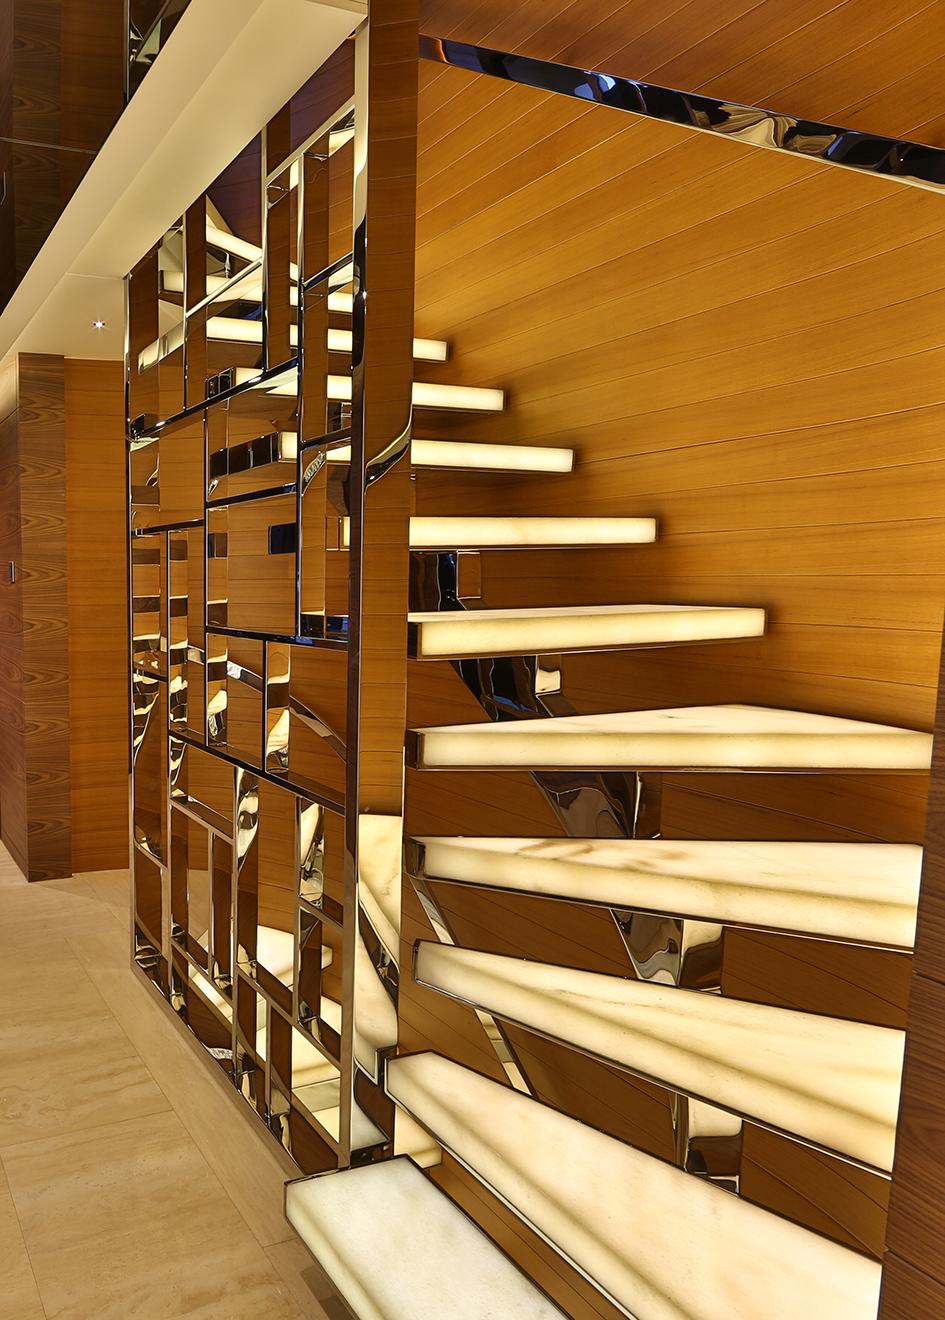 the-staircase-on-the-bilgin-superyacht-giaola-lu